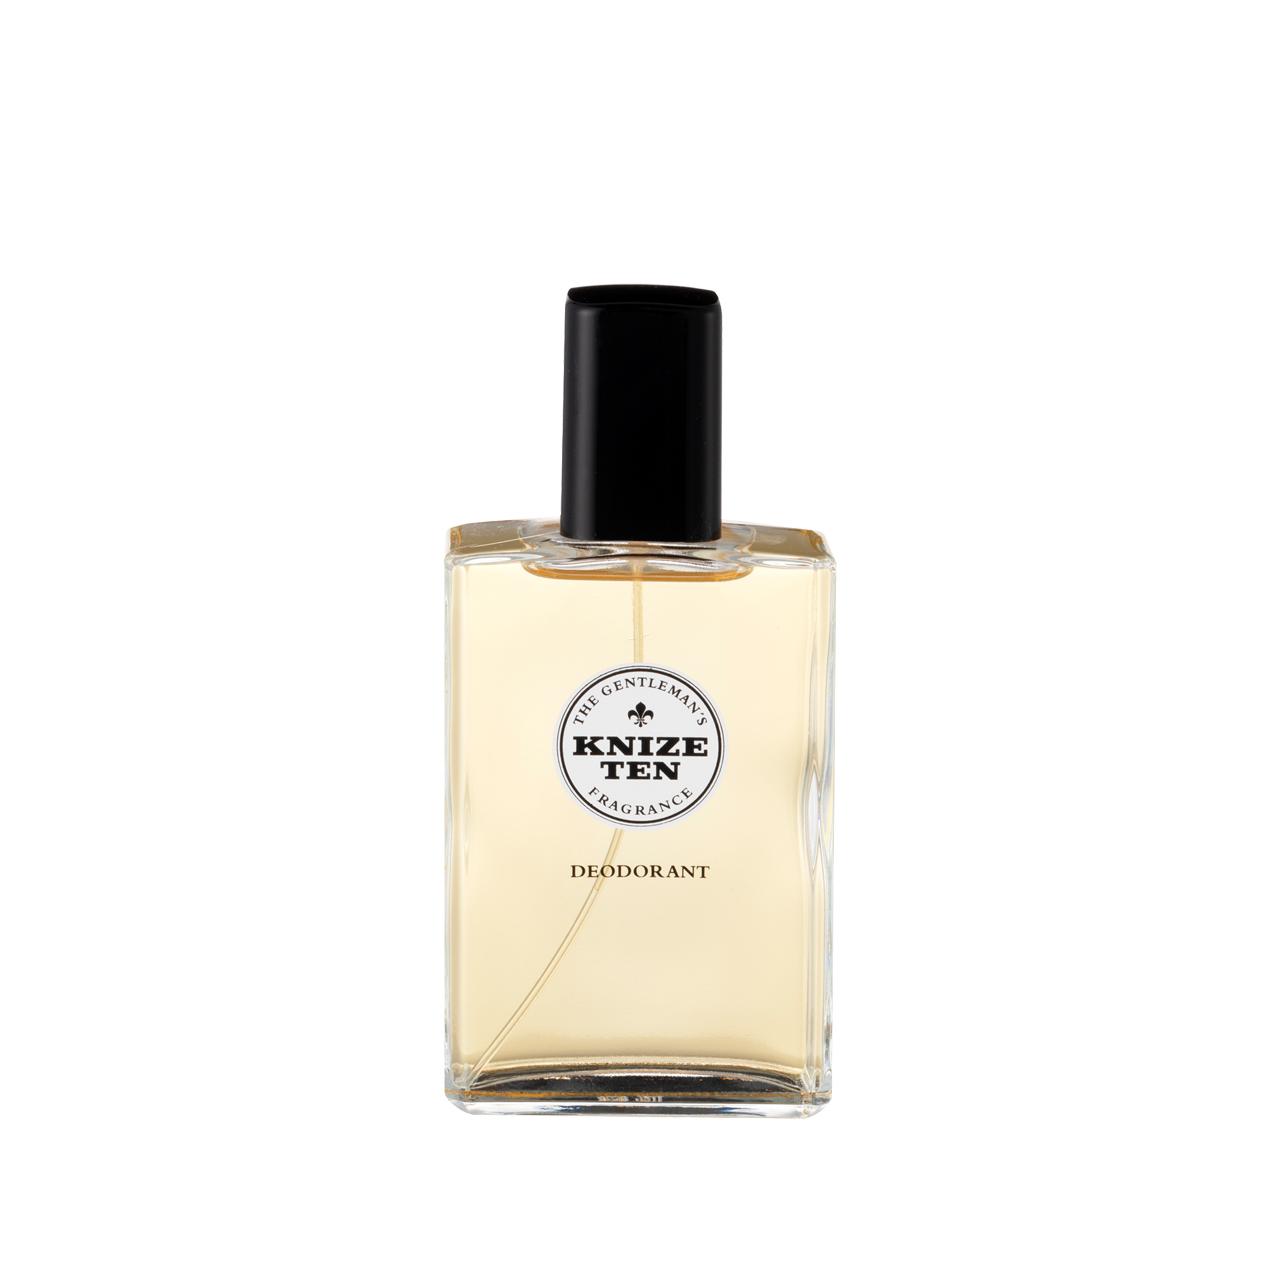 Ten - Deodorant Spray